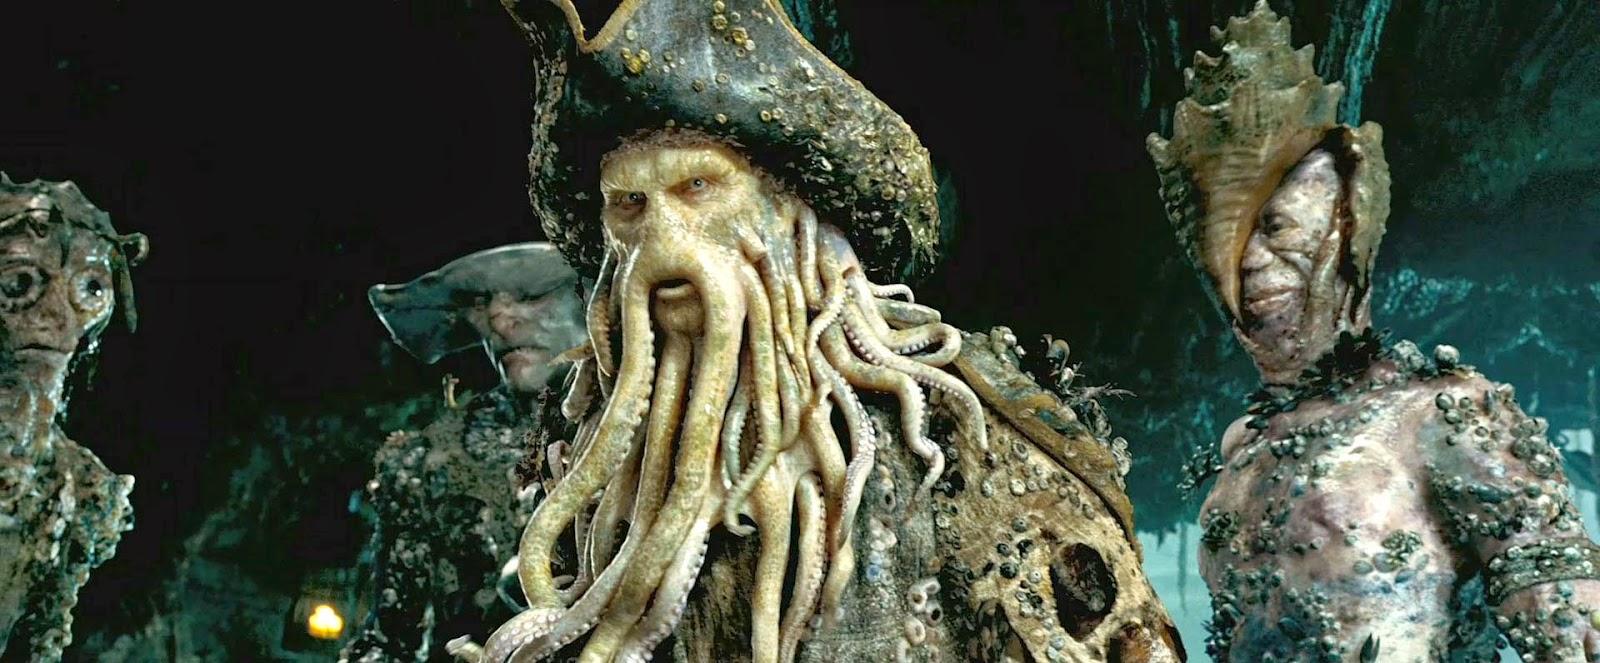 Davy jones(Pirates Of The Caribbean):